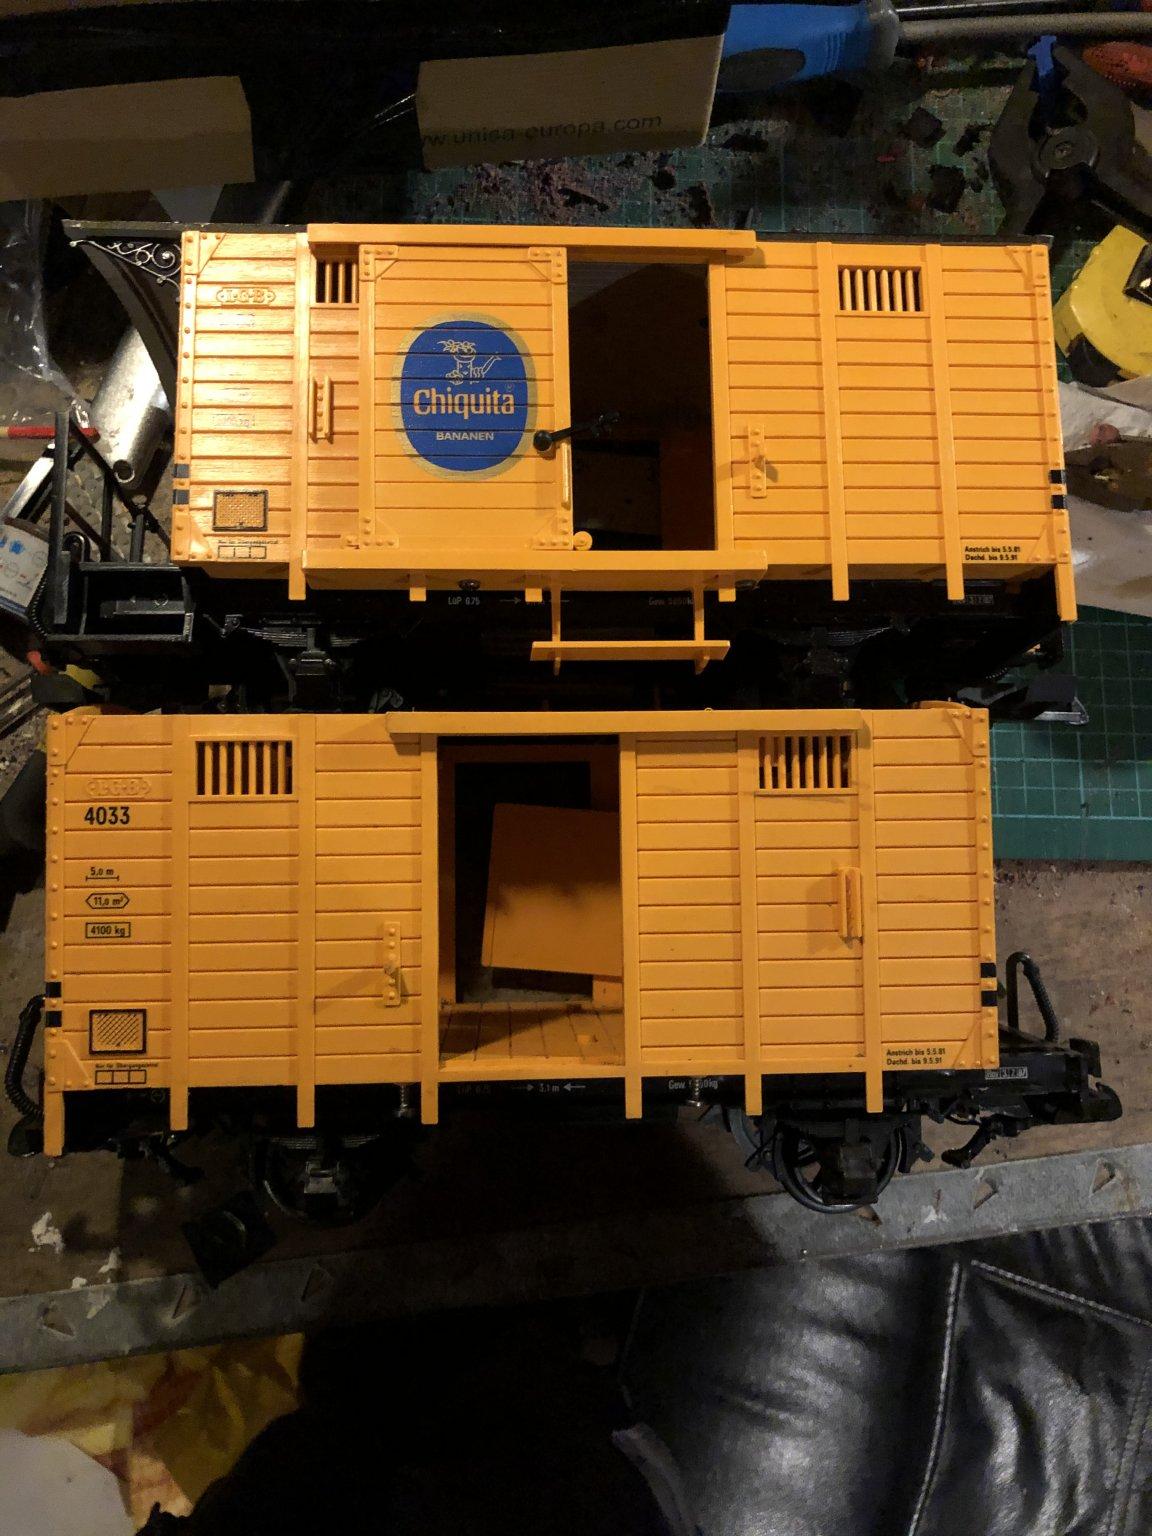 75A816A6-F8B0-47D8-8FAB-D8A6D799F59E.jpeg